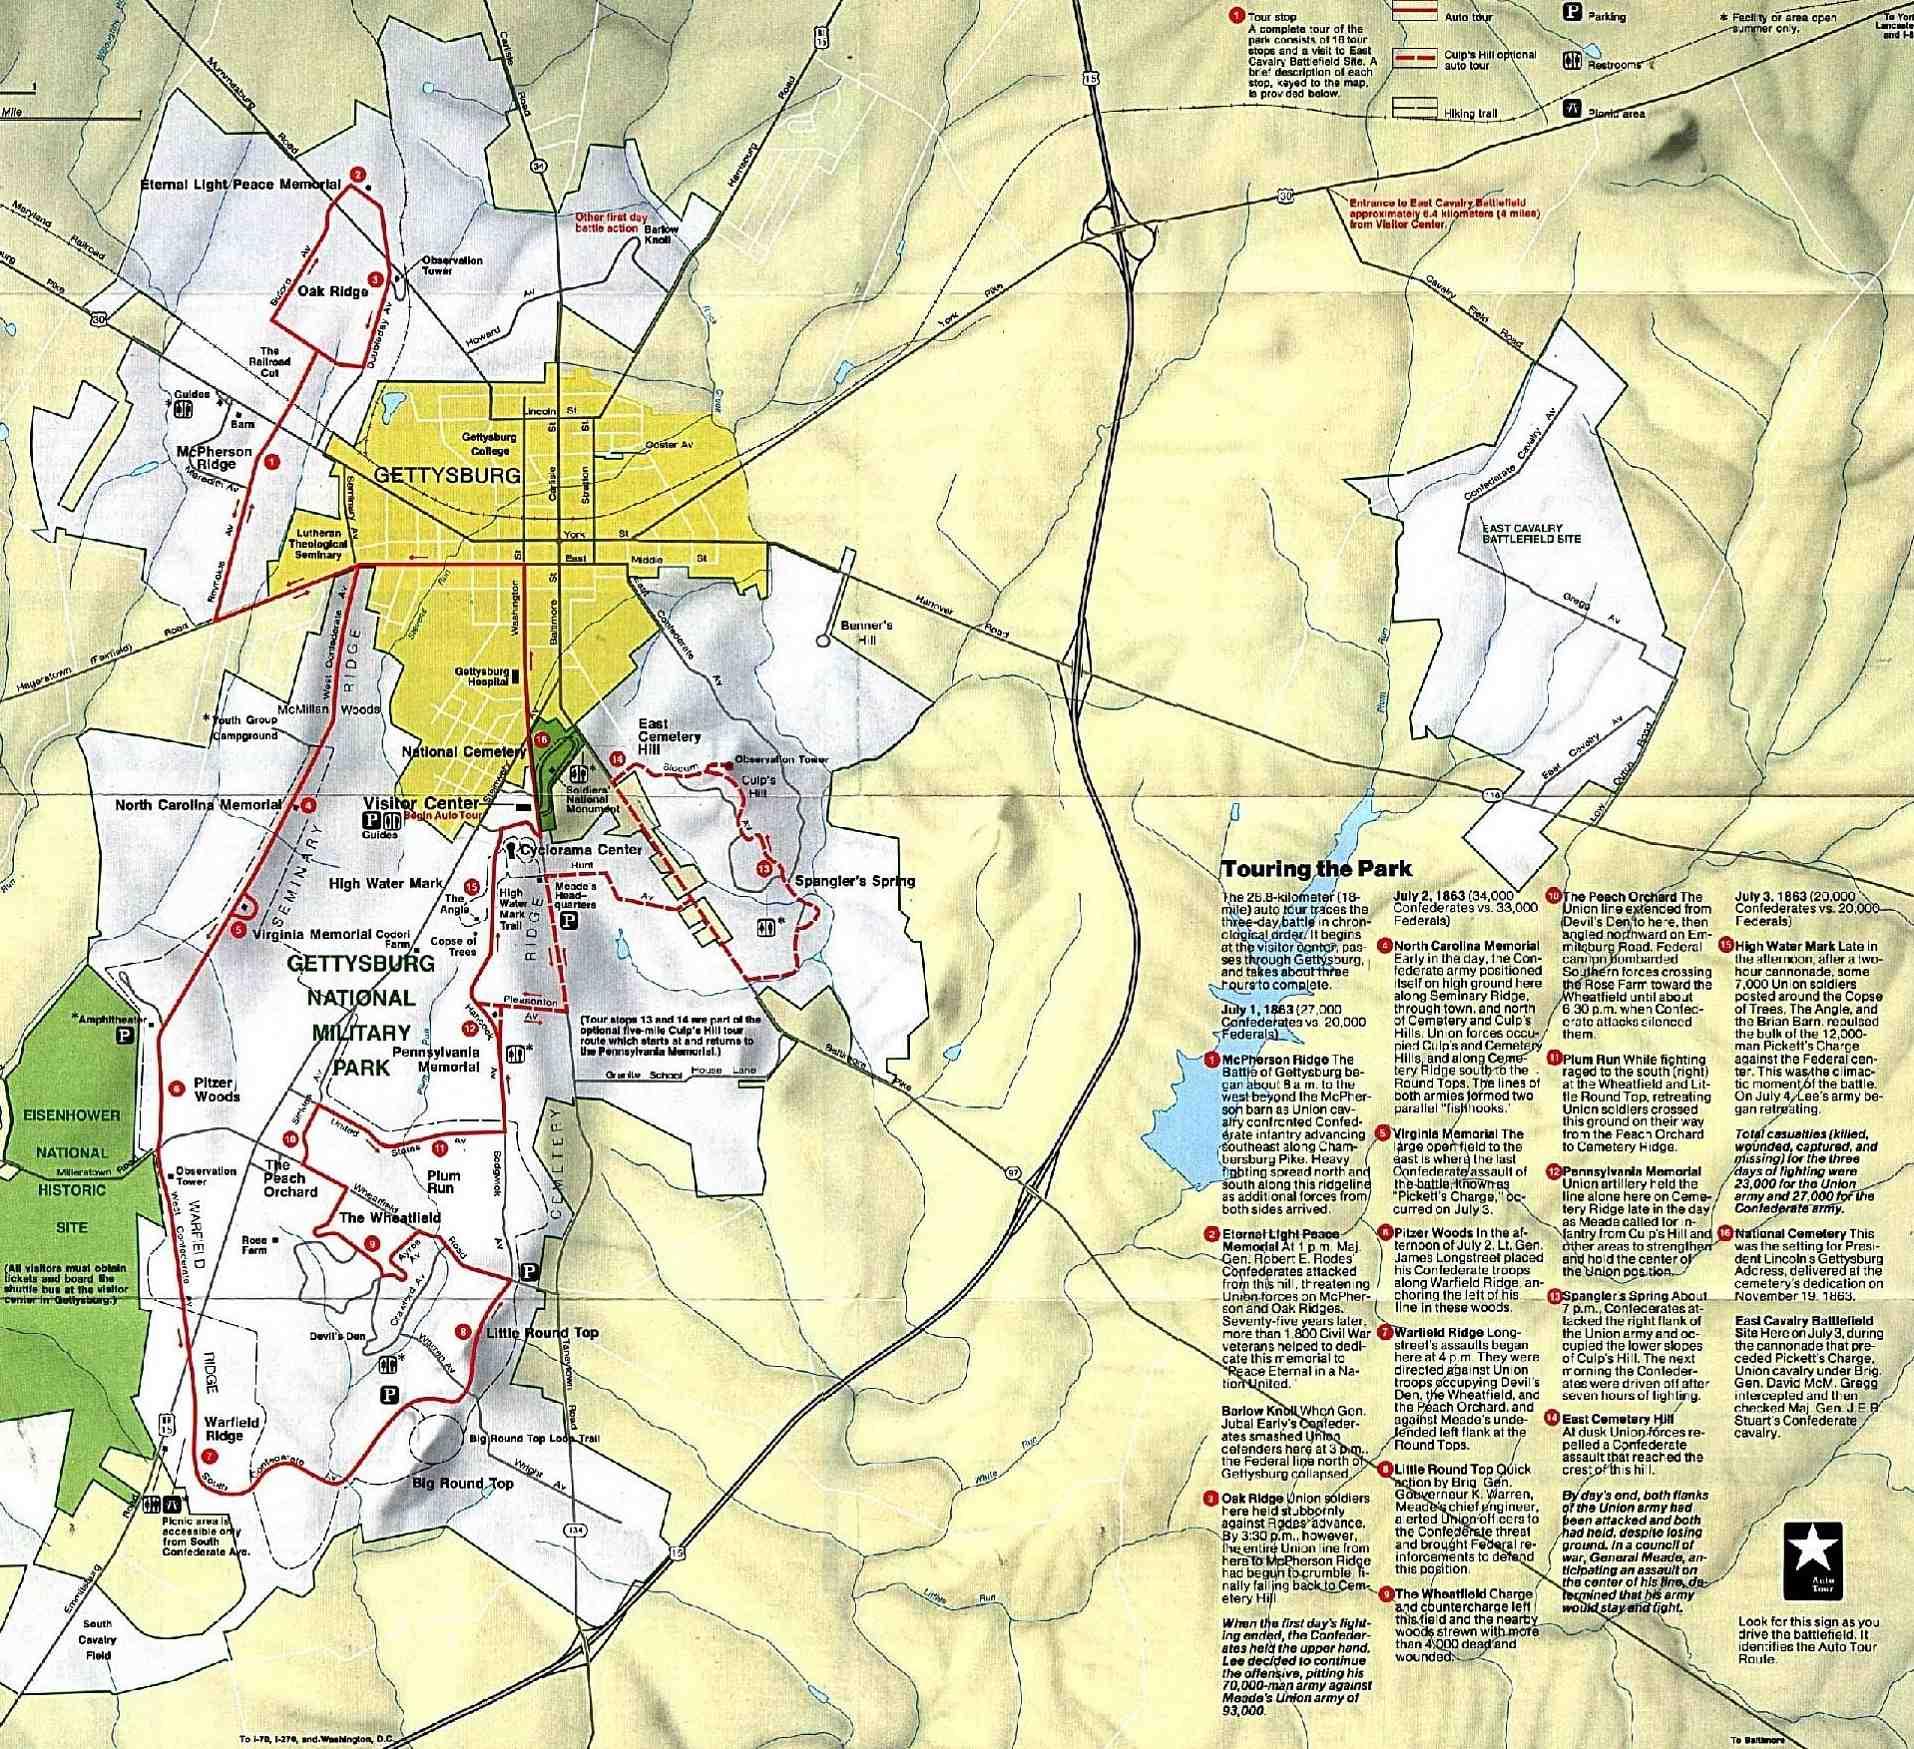 Gettysburg Military Park Map